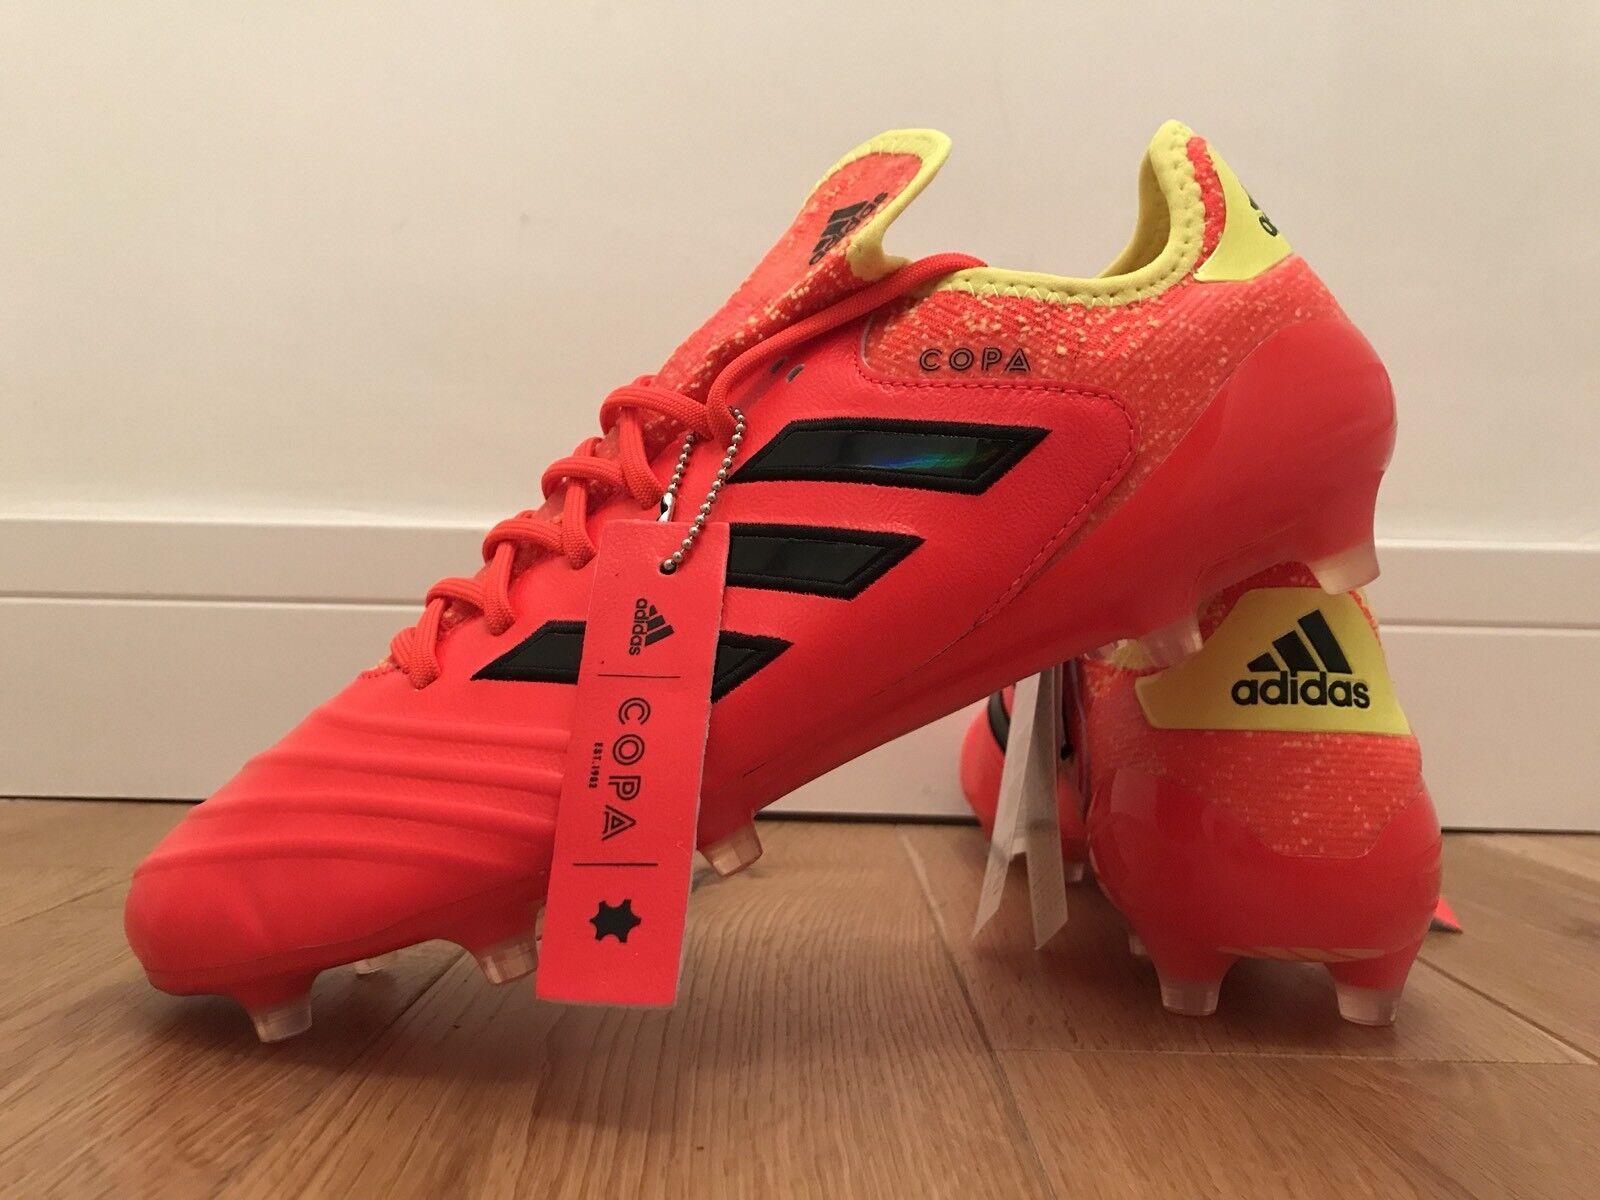 Adidas Copa 18.1 FG botas de fútbol (Pro Edition) UK Talla 9